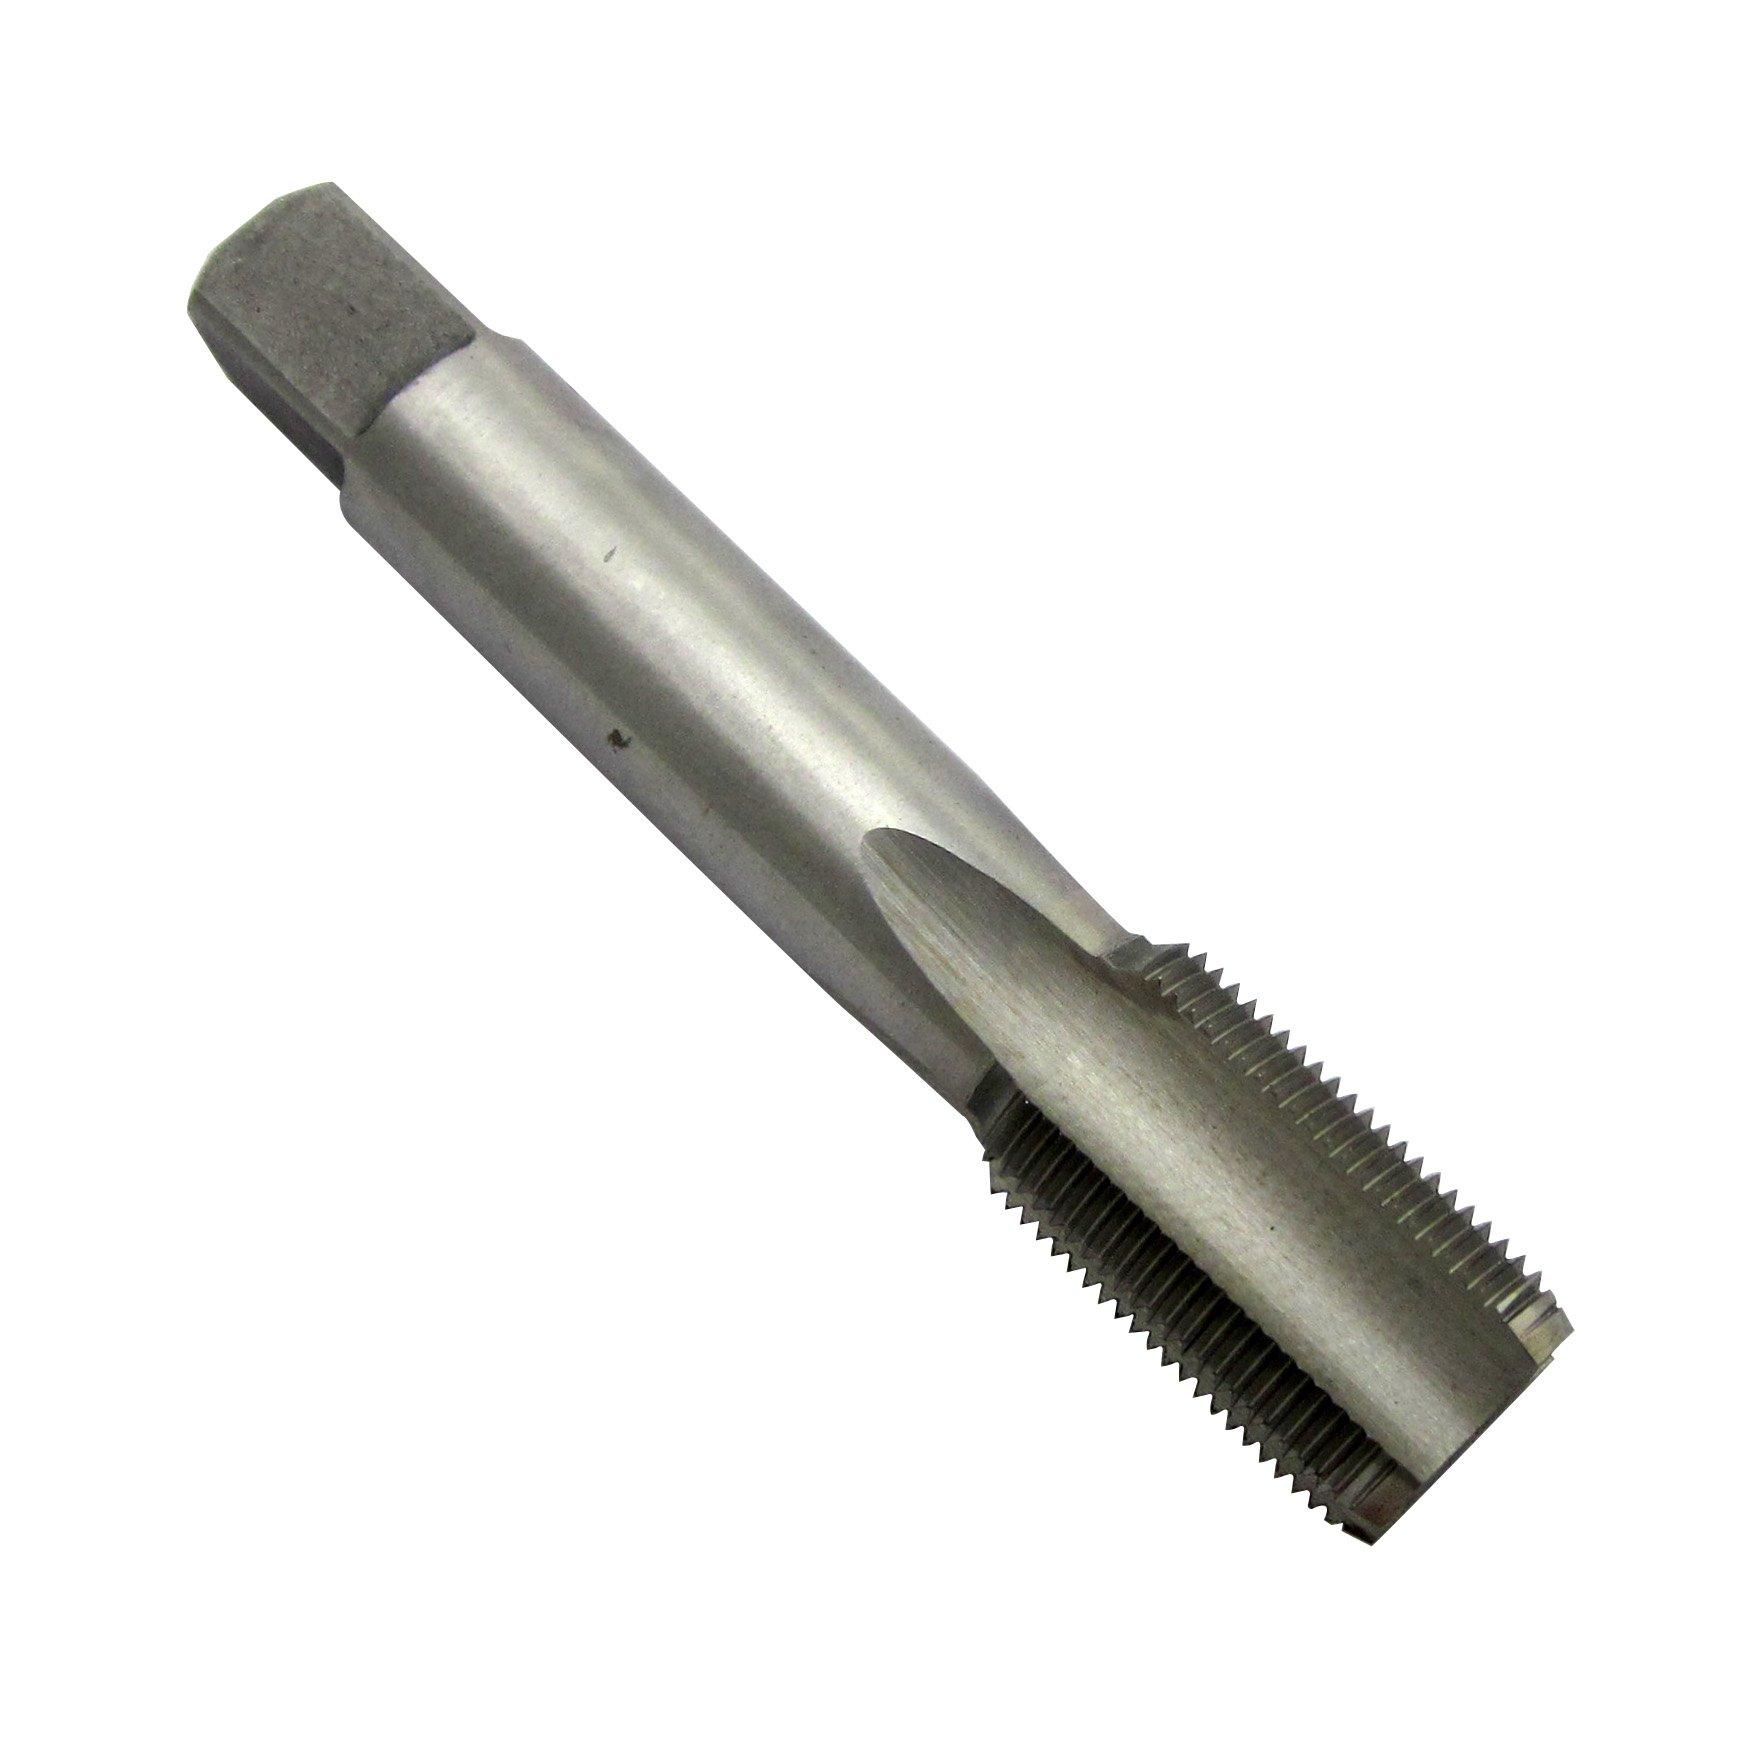 US Stock HSS 22mm x 2 Metric Die Right Hand Thread M22 x 2mm Pitch